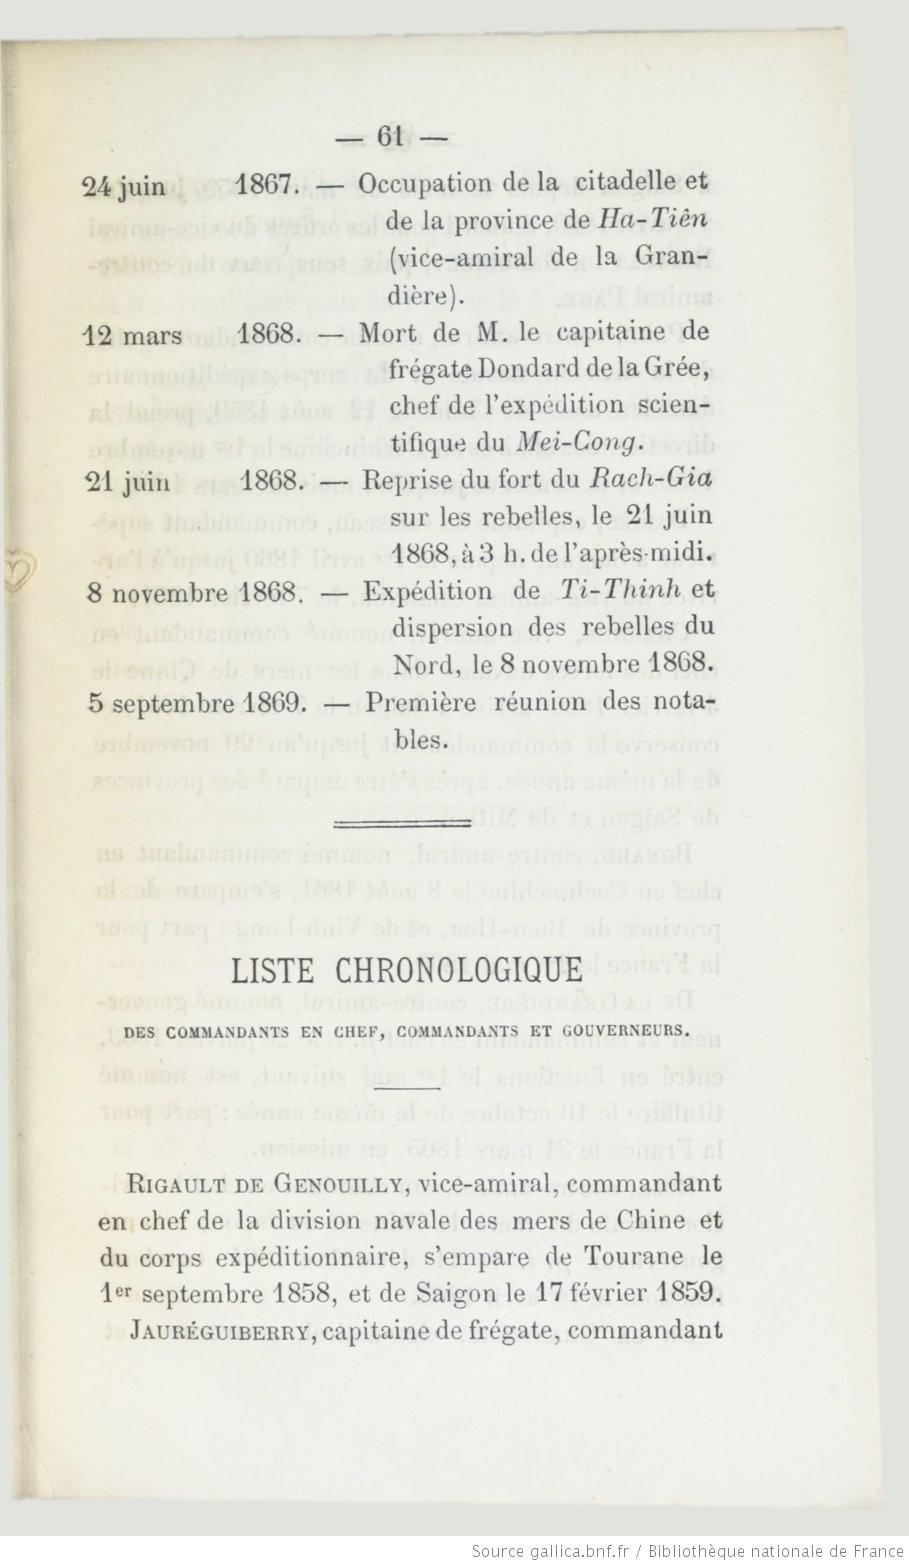 http://gallica.bnf.fr/ark:/12148/bpt6k62082122/f69.highres